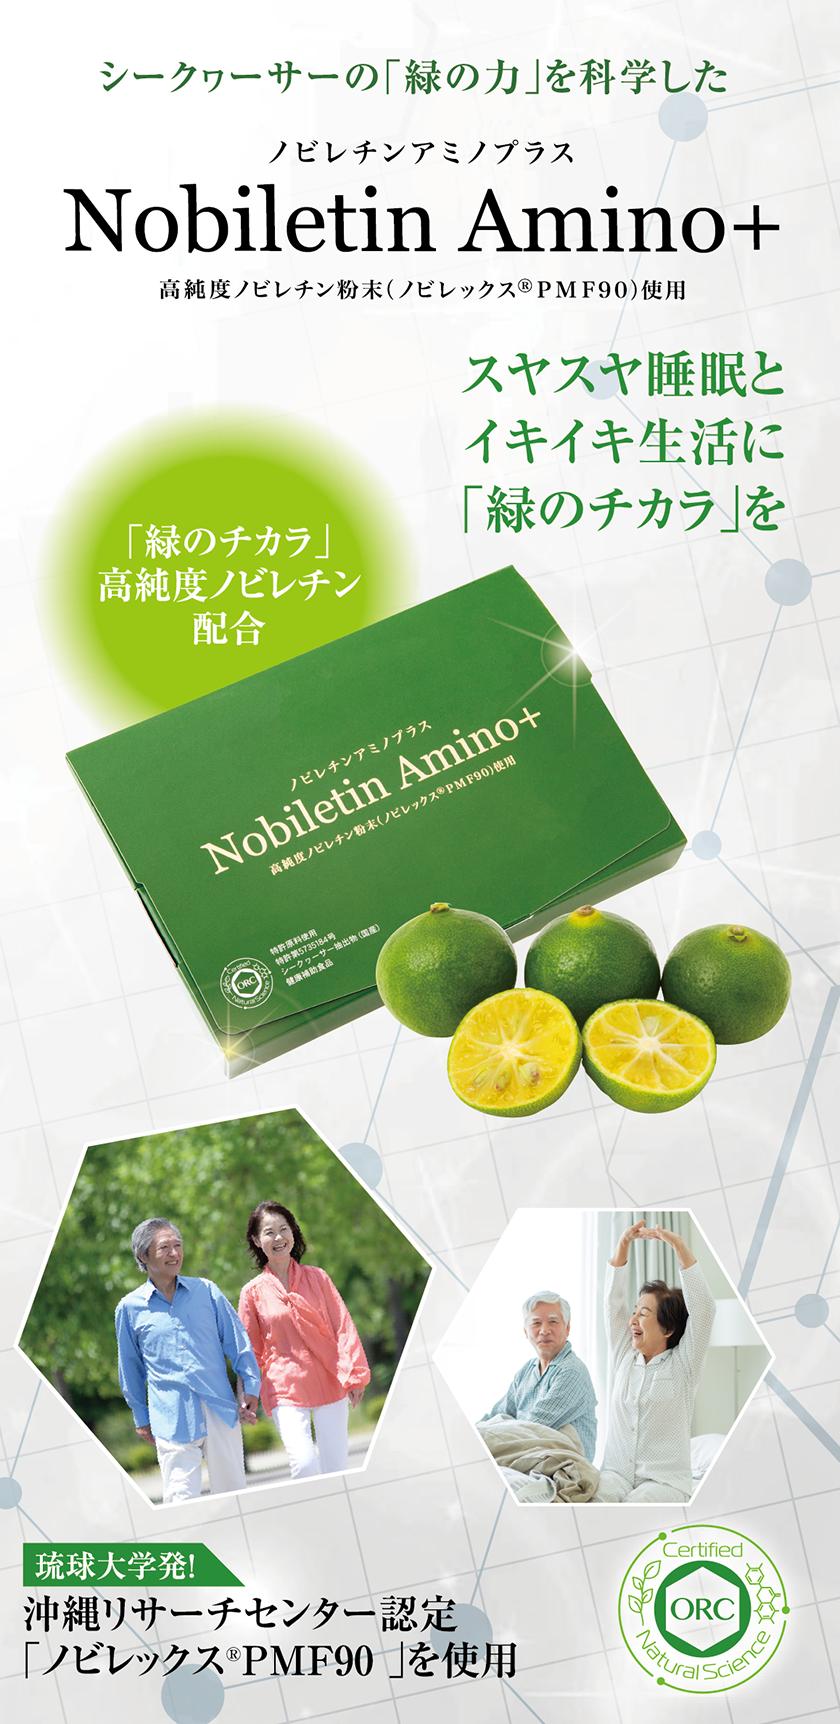 Nobiletin Amino+ 高純度ノビレチン粉末(ノビレックス®PMF90)使用